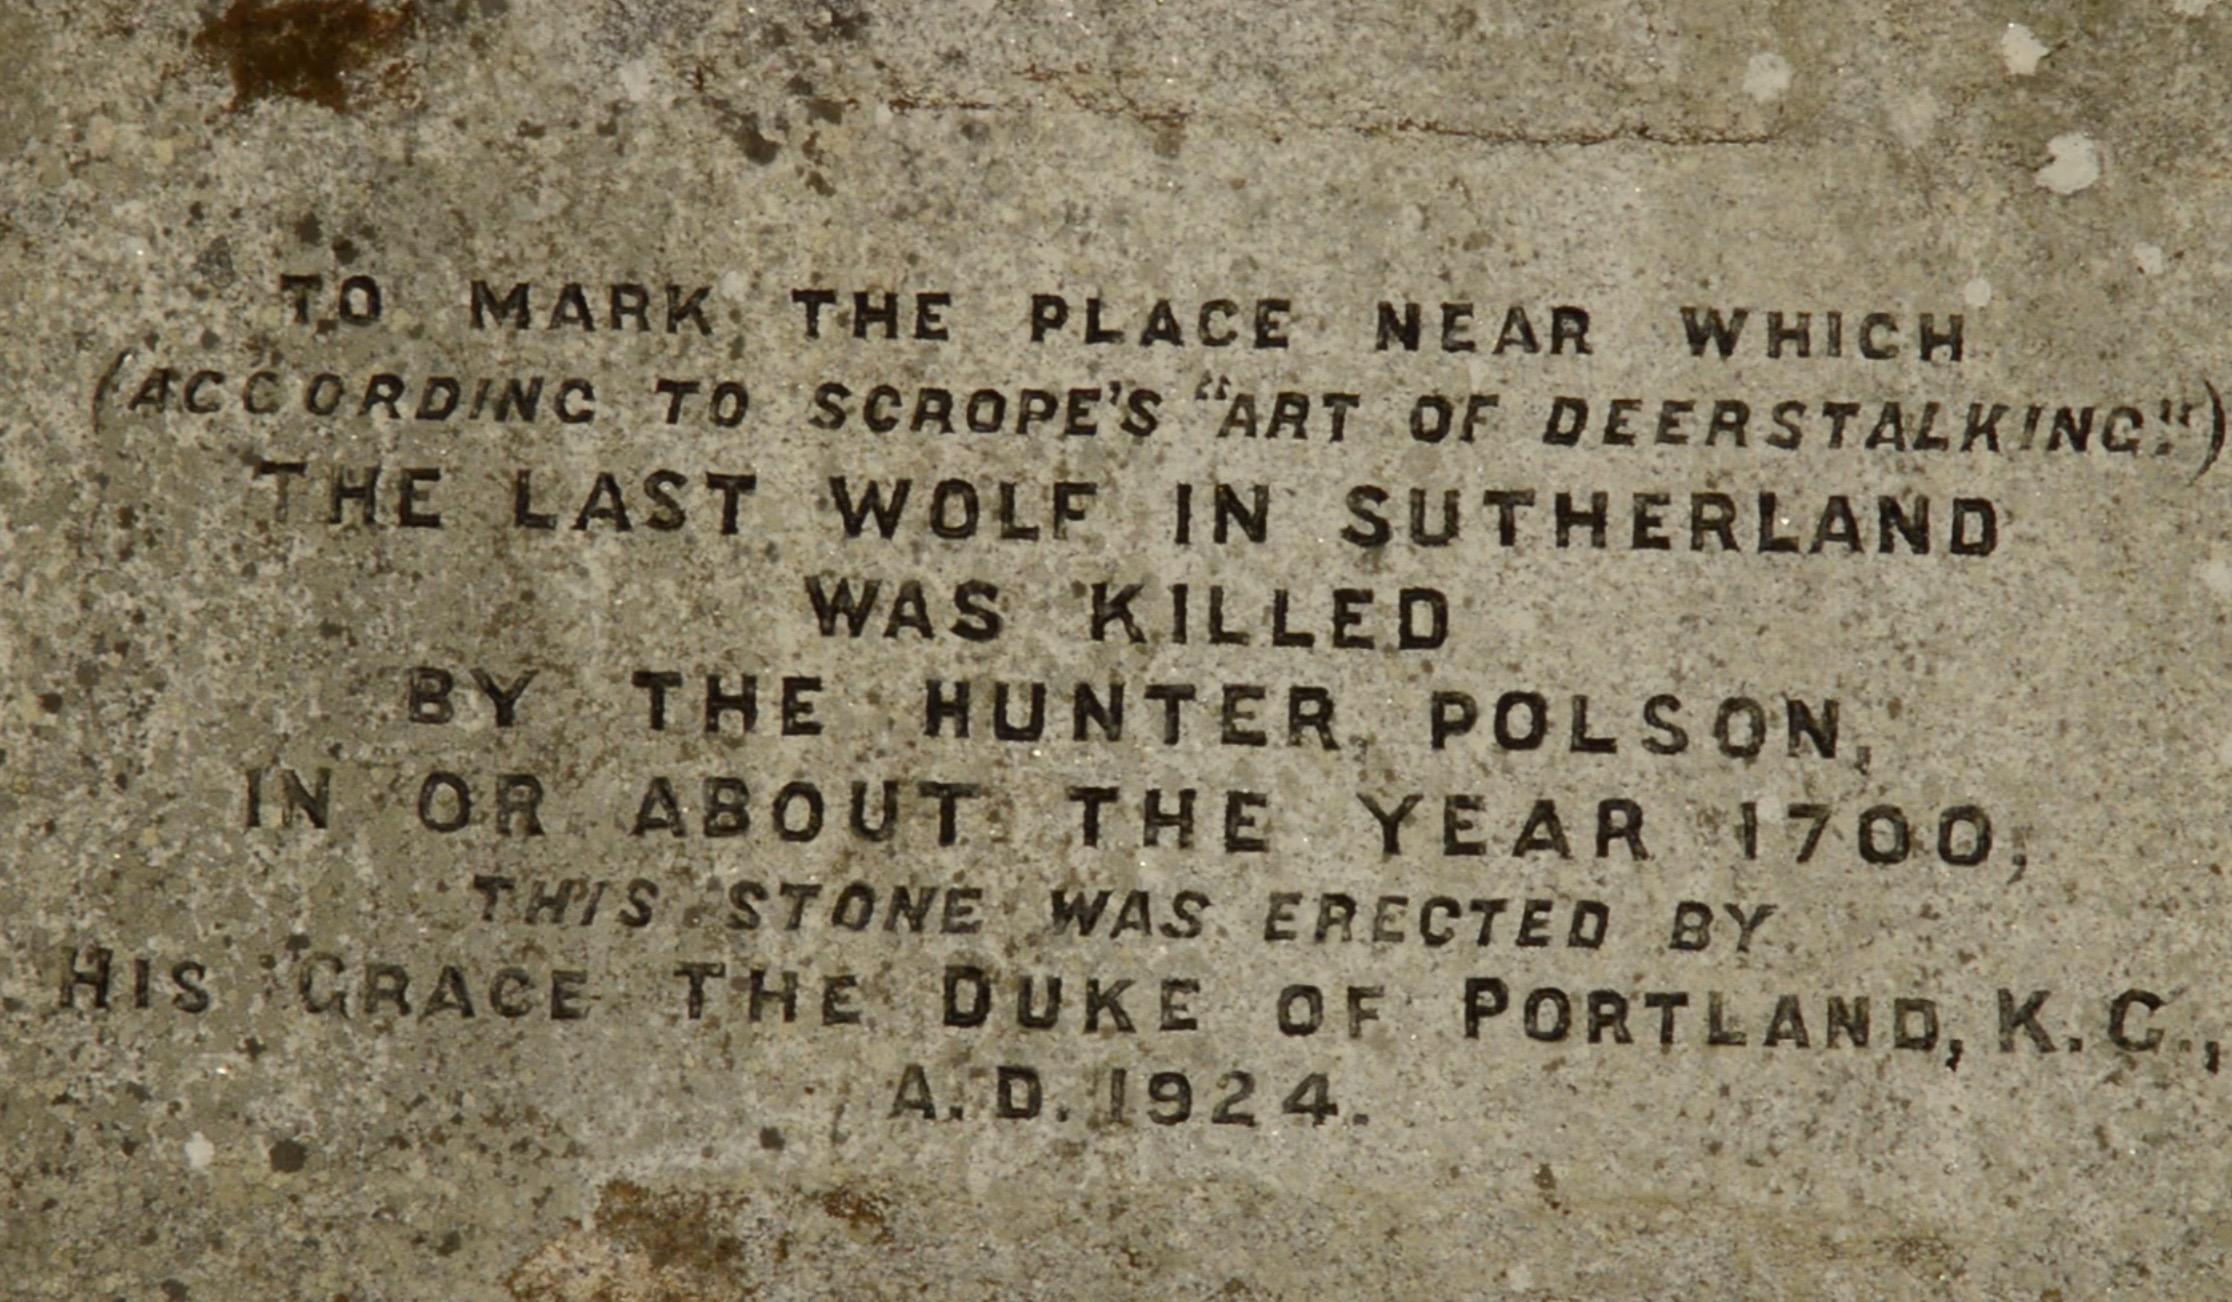 Polson Stone last wolf